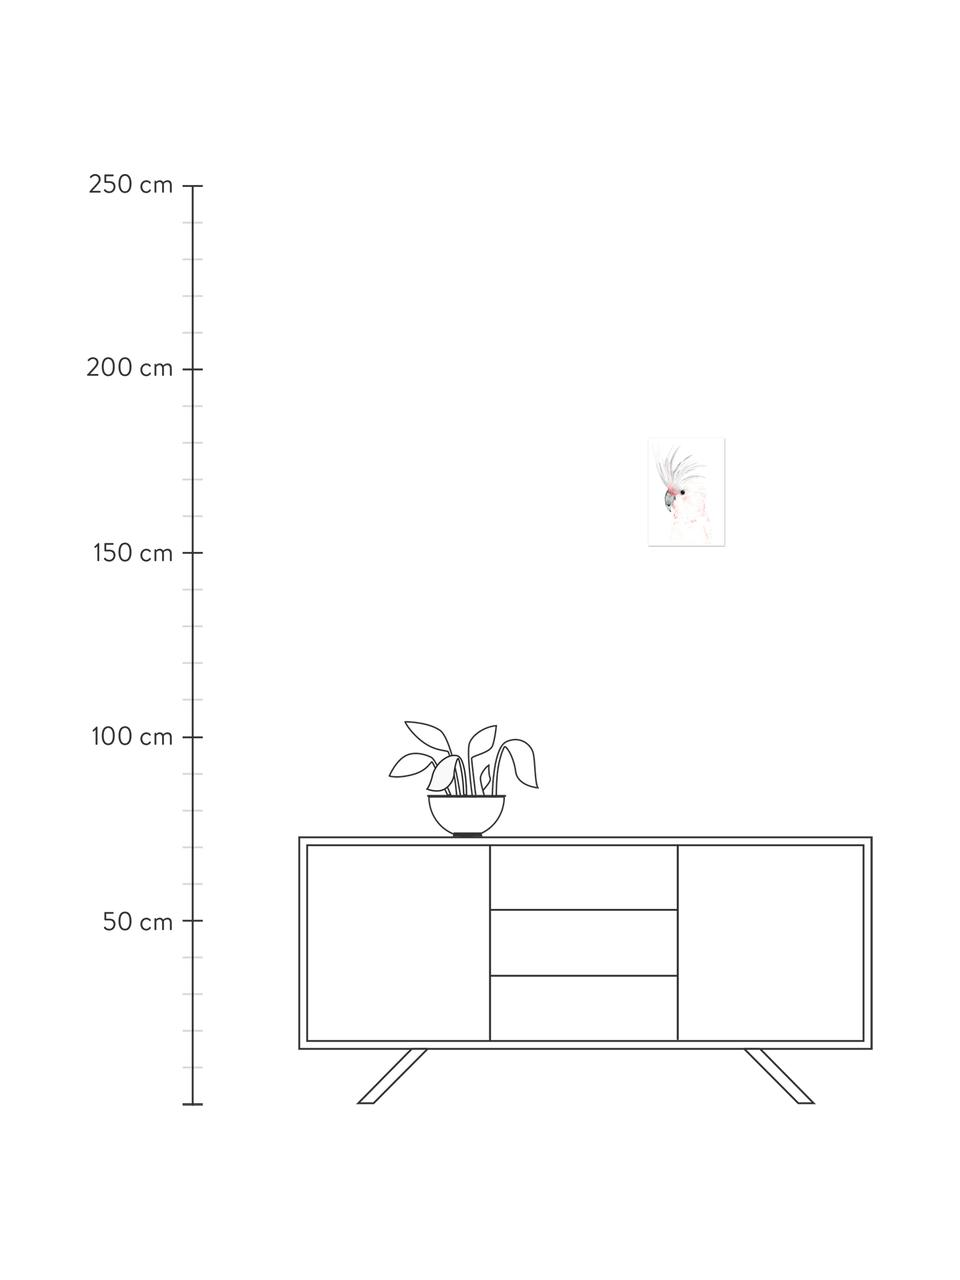 Poster Kakadu, Digitaldruck auf Papier, 200 g/m², Weiß, Grau, Rosa, 30 x 42 cm